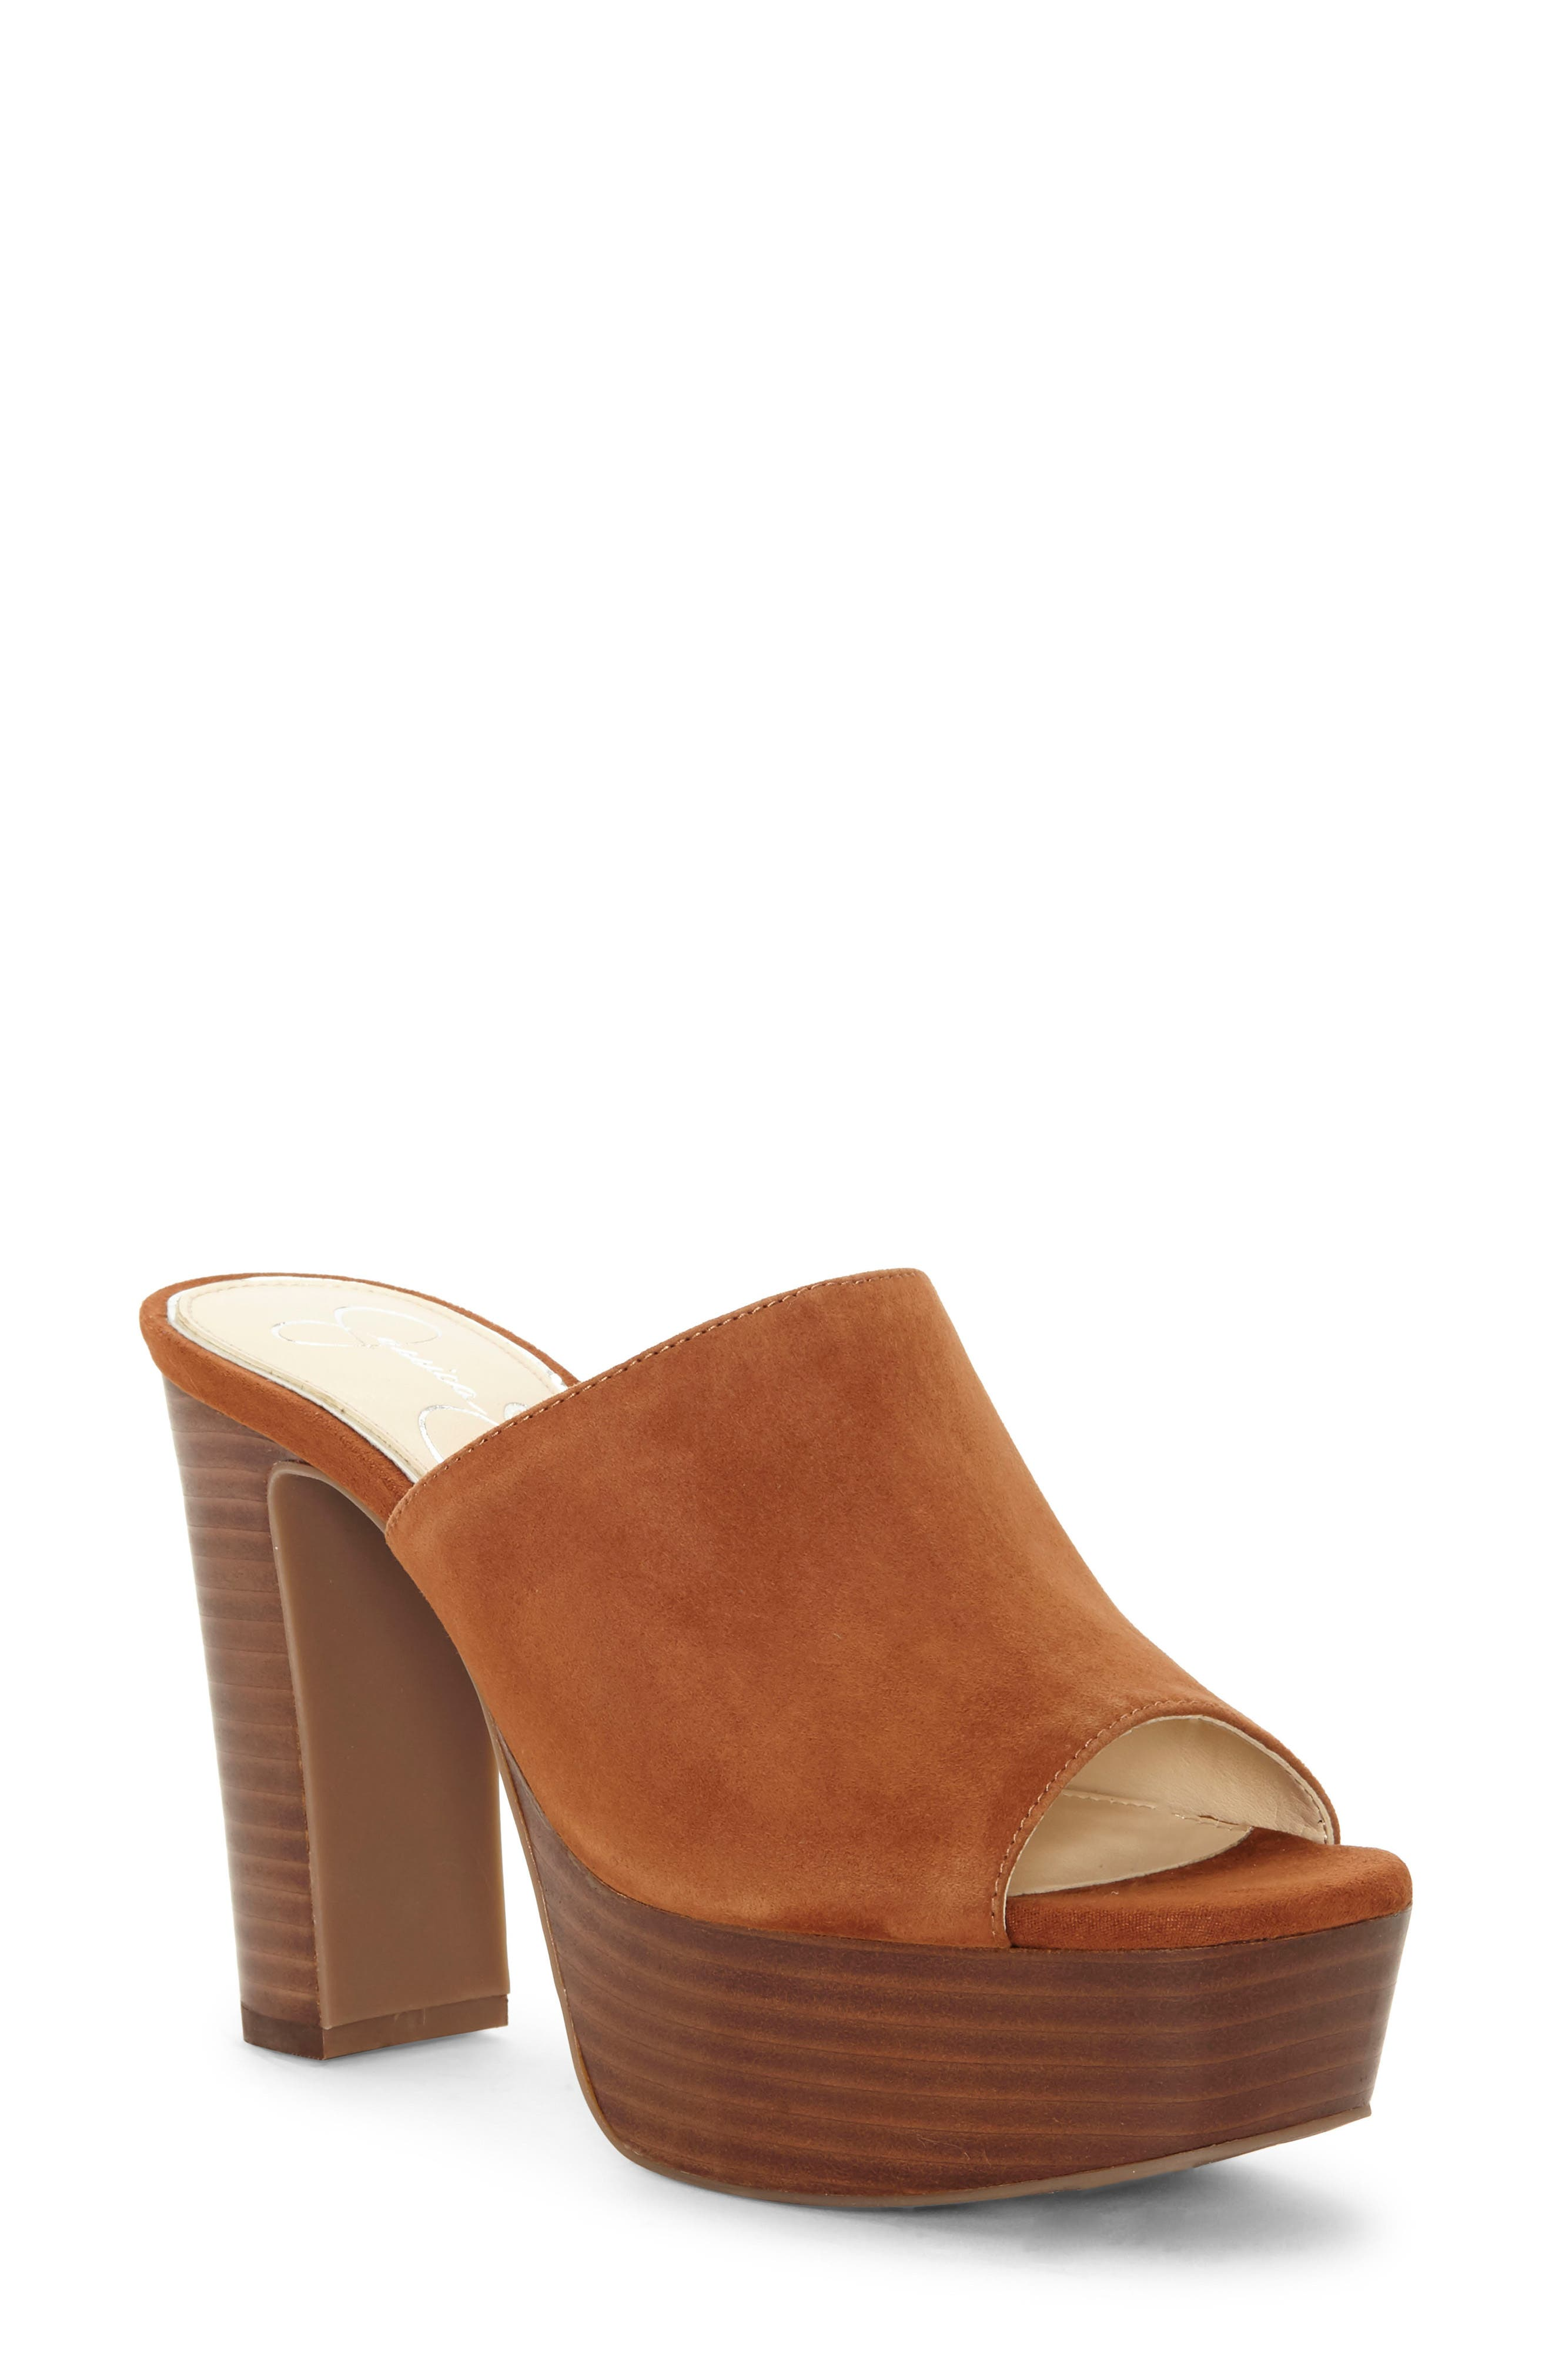 Jessica Simpson Camree Platform Sandal- Brown